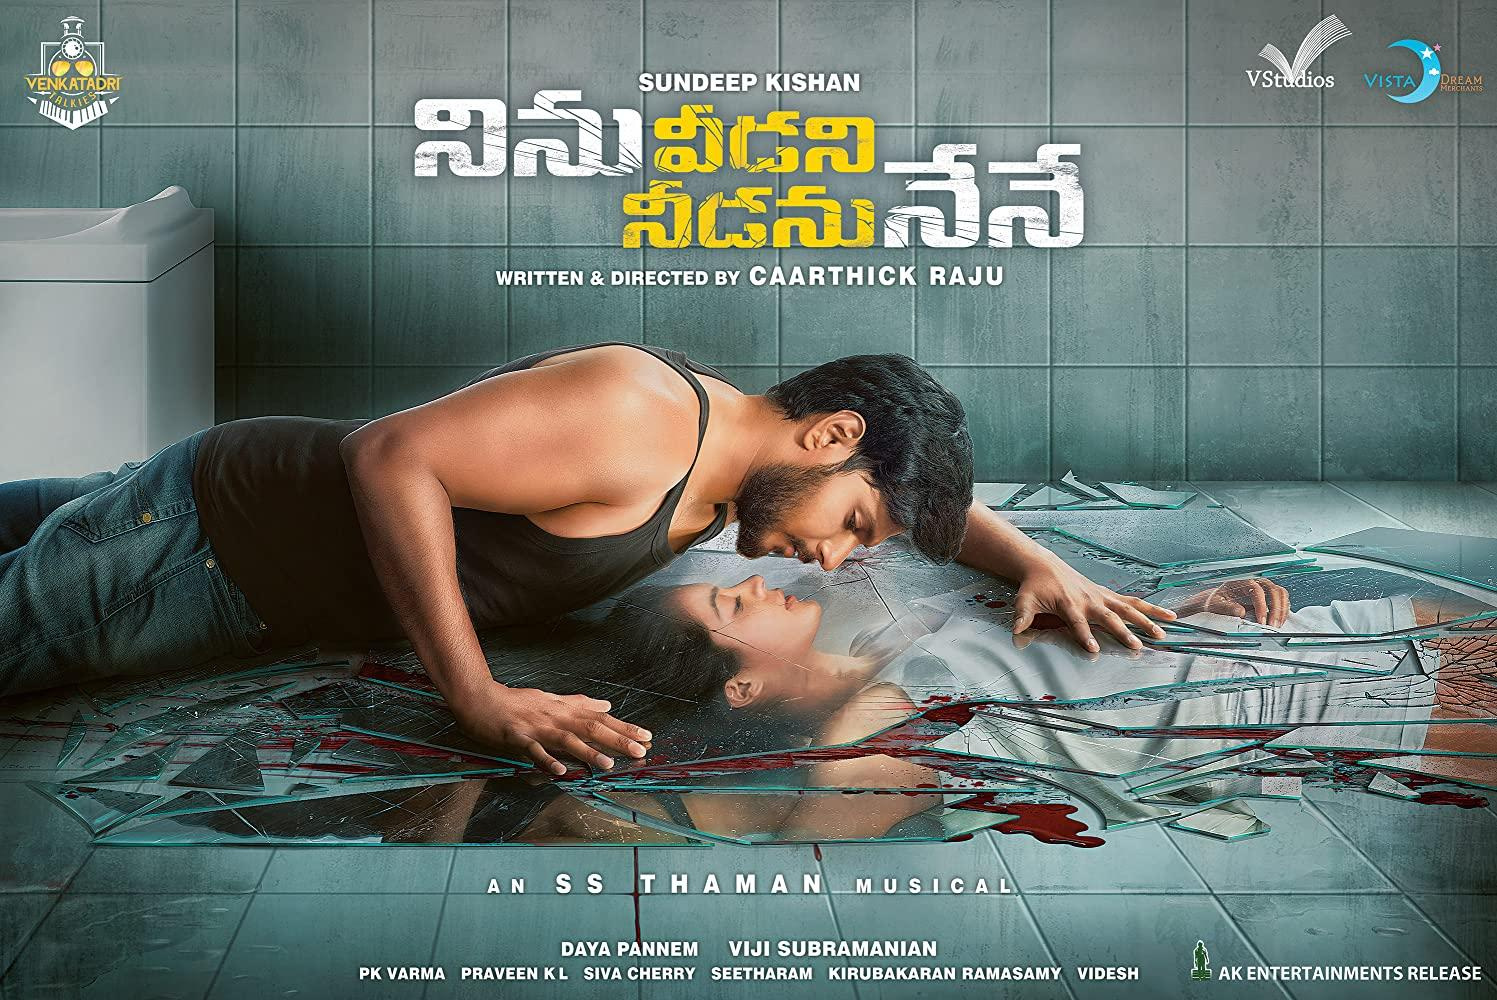 مشاهدة فيلم Ninu Veedani Needanu Nene (2019) مترجم HD اون لاين